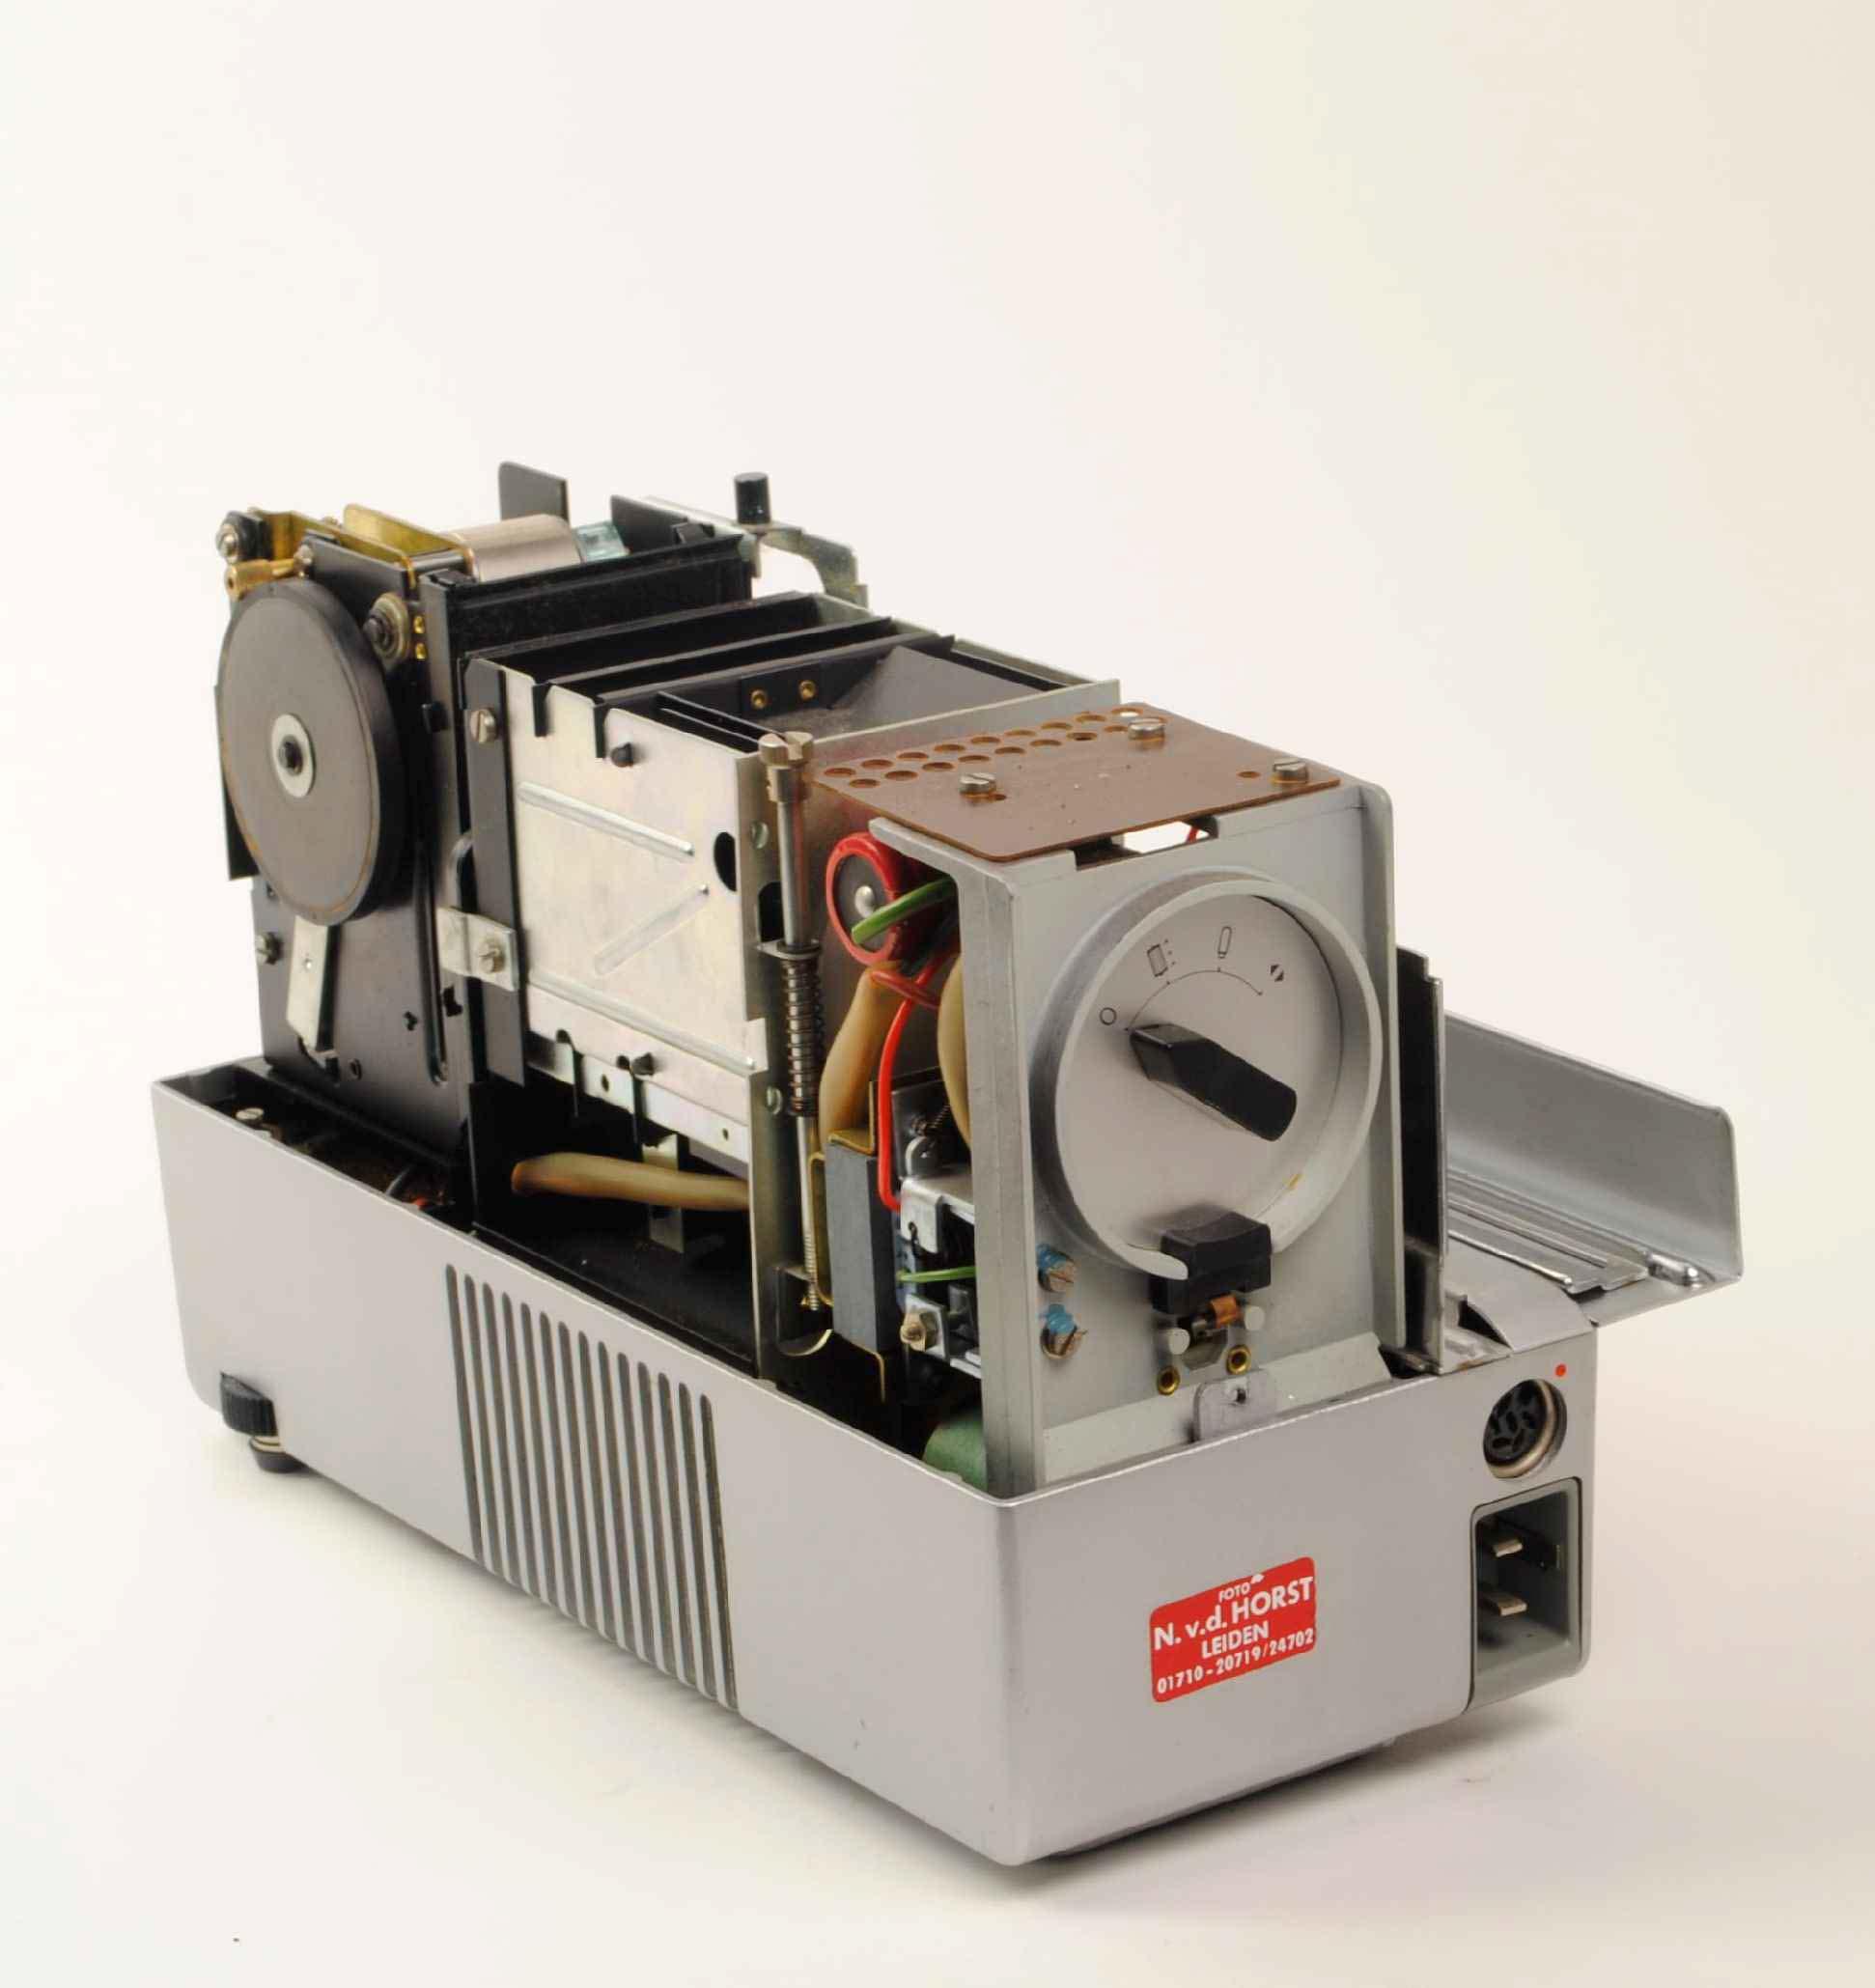 24V 150W Projector Lamp for  Braun Novamat 520 slide projector